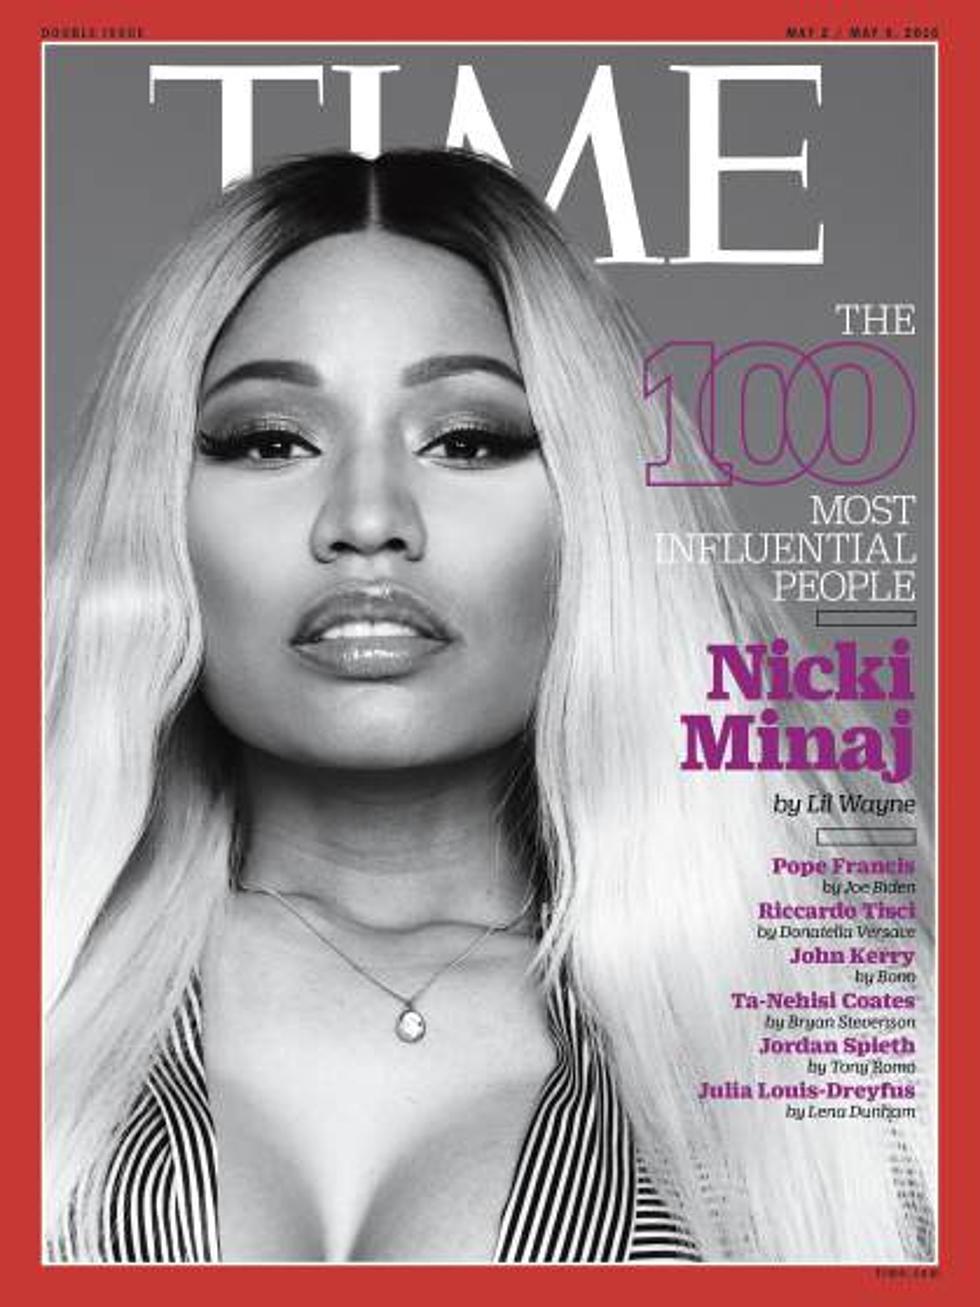 adeb7c21544 Nicki Minaj